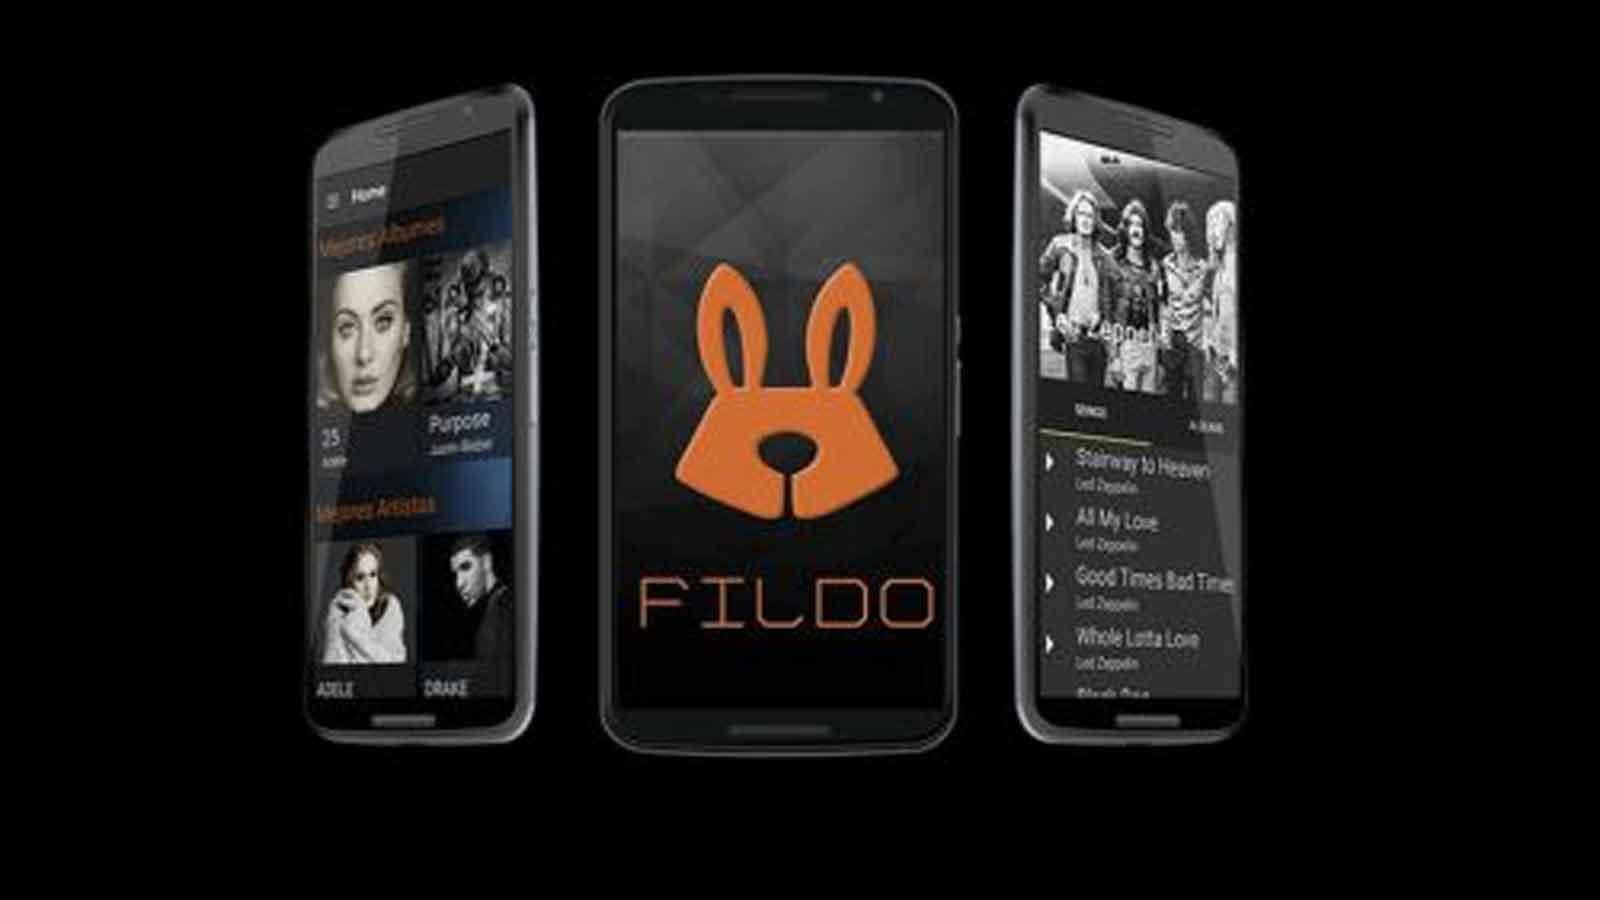 Fildo - ANdroid app